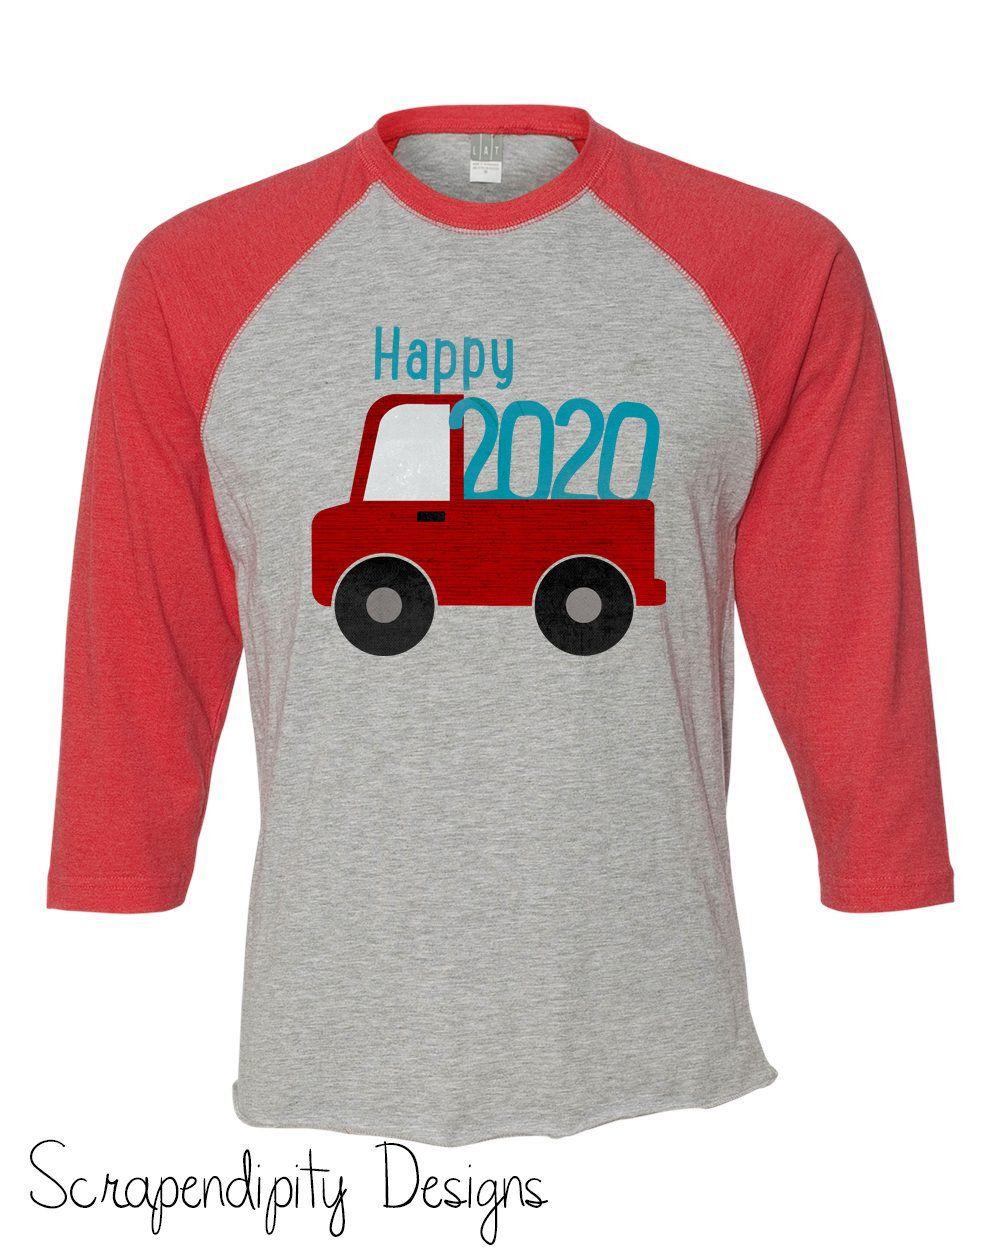 Toddler New Year Tshirt Happy 2021 Outfit Happy 2021 Shirt Etsy Raglan Shirts New Years Shirts Truck Shirts